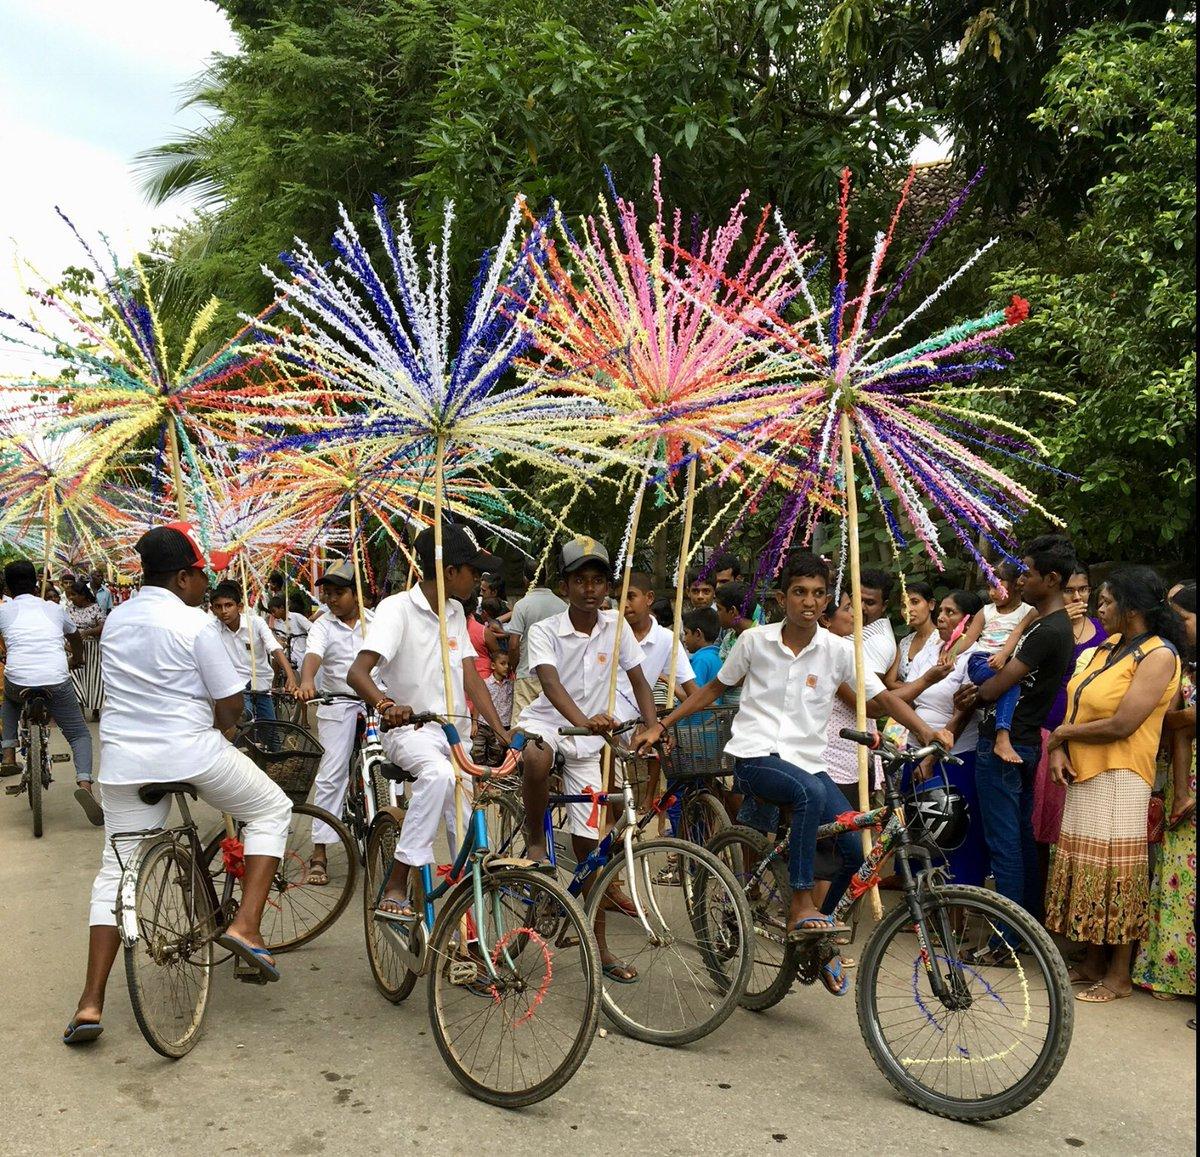 Local Religious Festival, Galle.   @thepavilionvilla  #srilankanfestivals #poyadayfestival #Unawatunaparades #srilankanelephants pic.twitter.com/tQFxfMjiW0